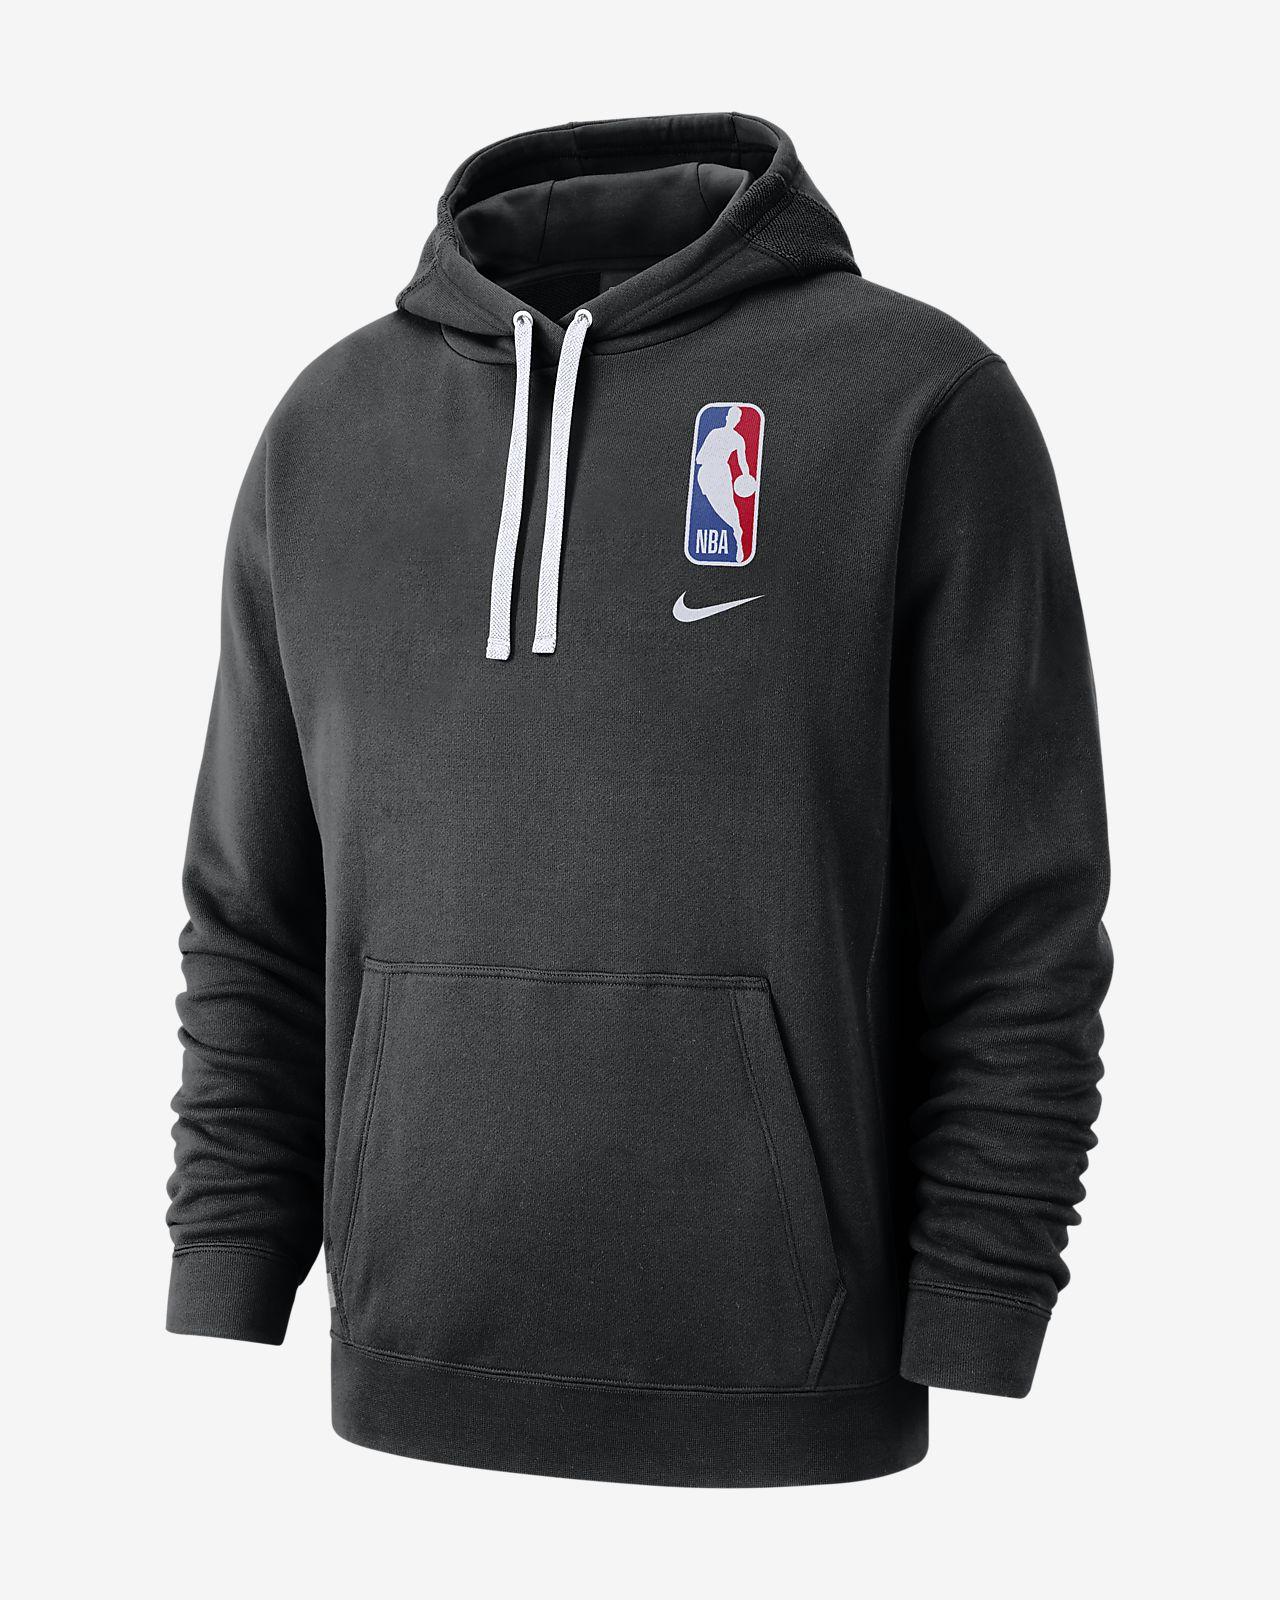 Мужская худи НБА Nike